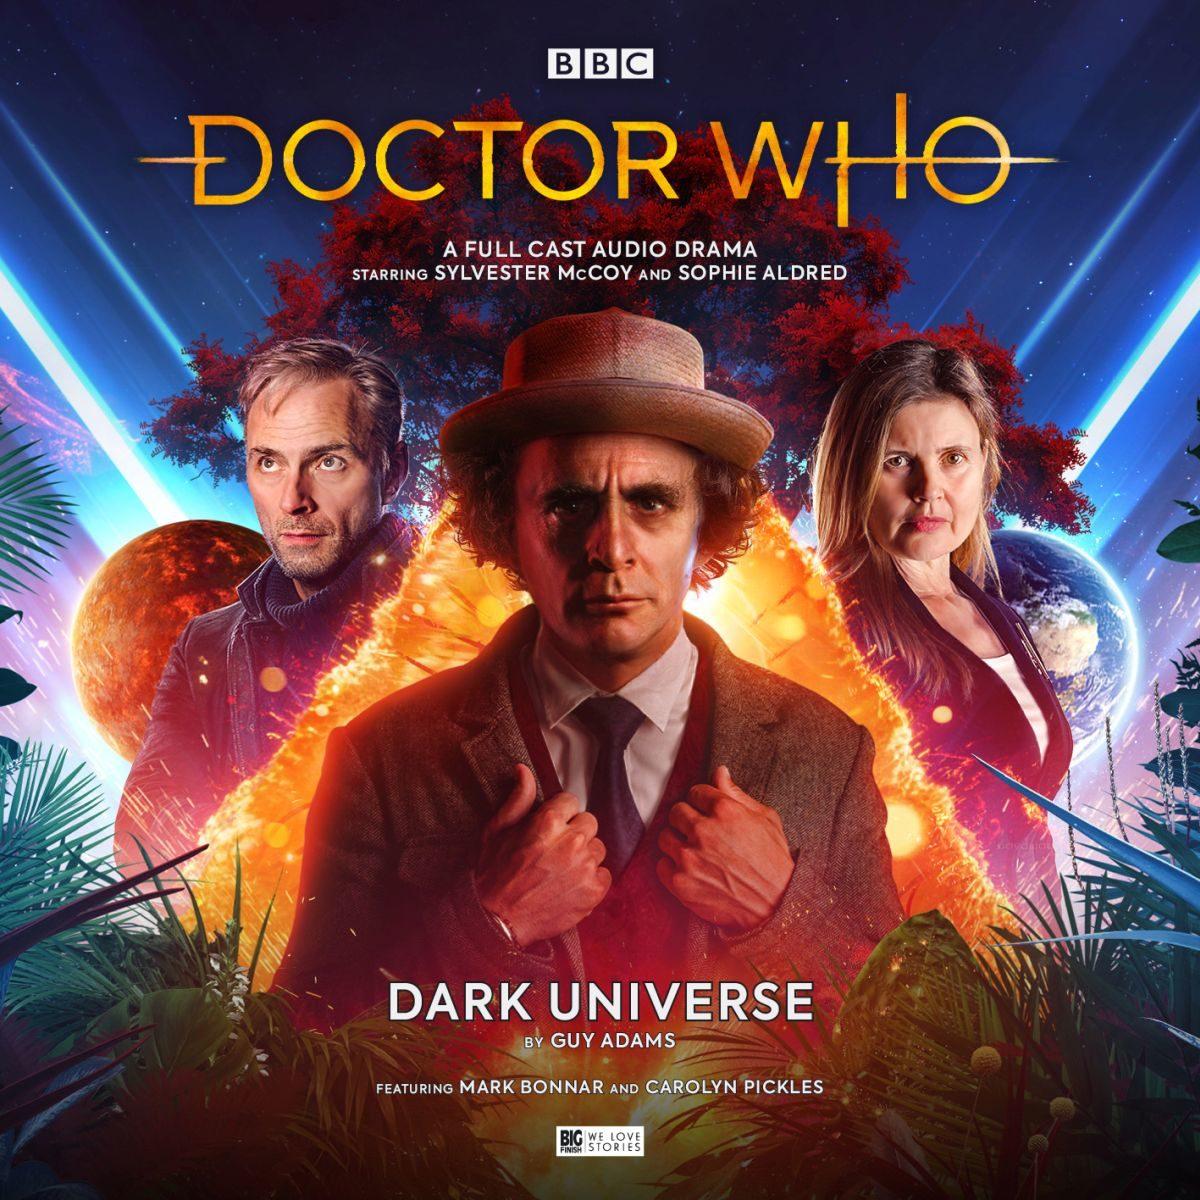 Doctor Who Dark Universe